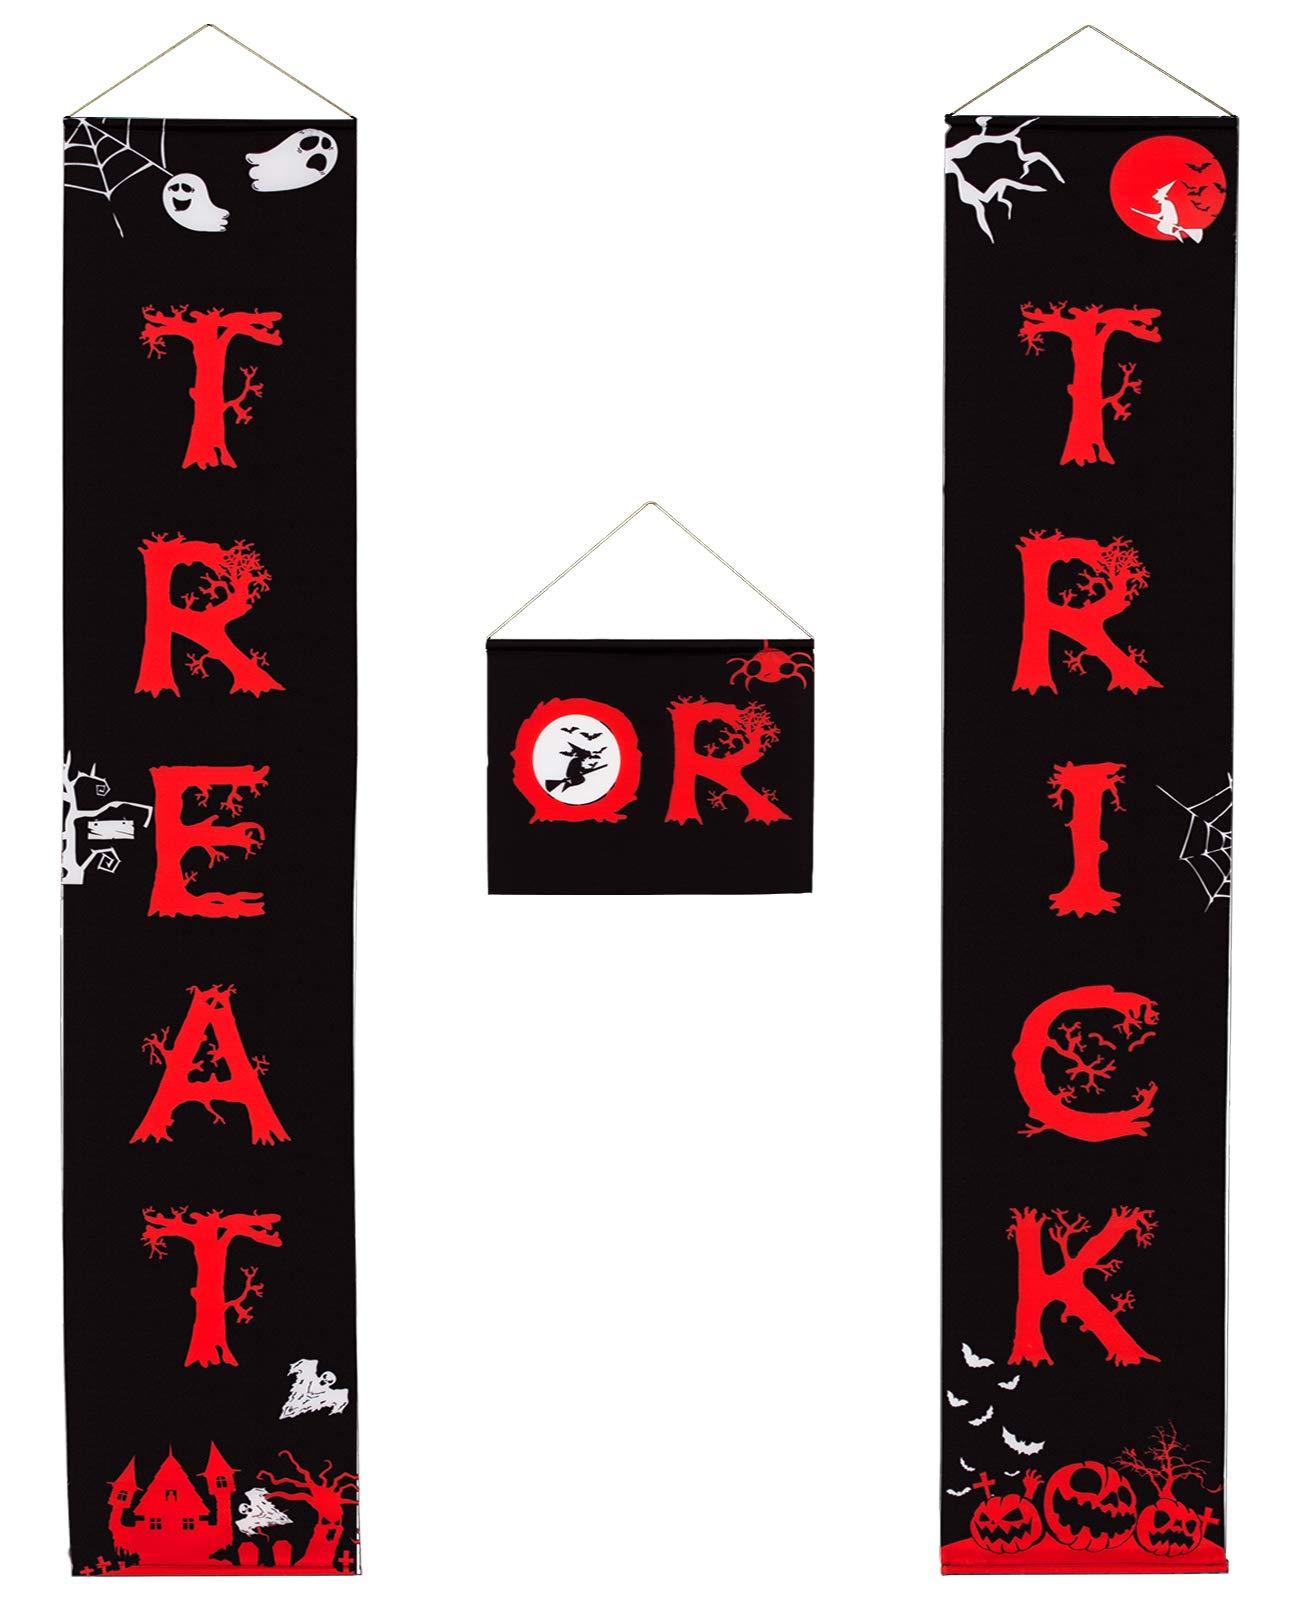 MEWTOGO Halloween Trick or Treat Banners - Halloween Hanging Door Sign for Home Indoor/Outdoor Halloween Decor - Well-Designed Halloween Decorations for Ready to Welcome Kids